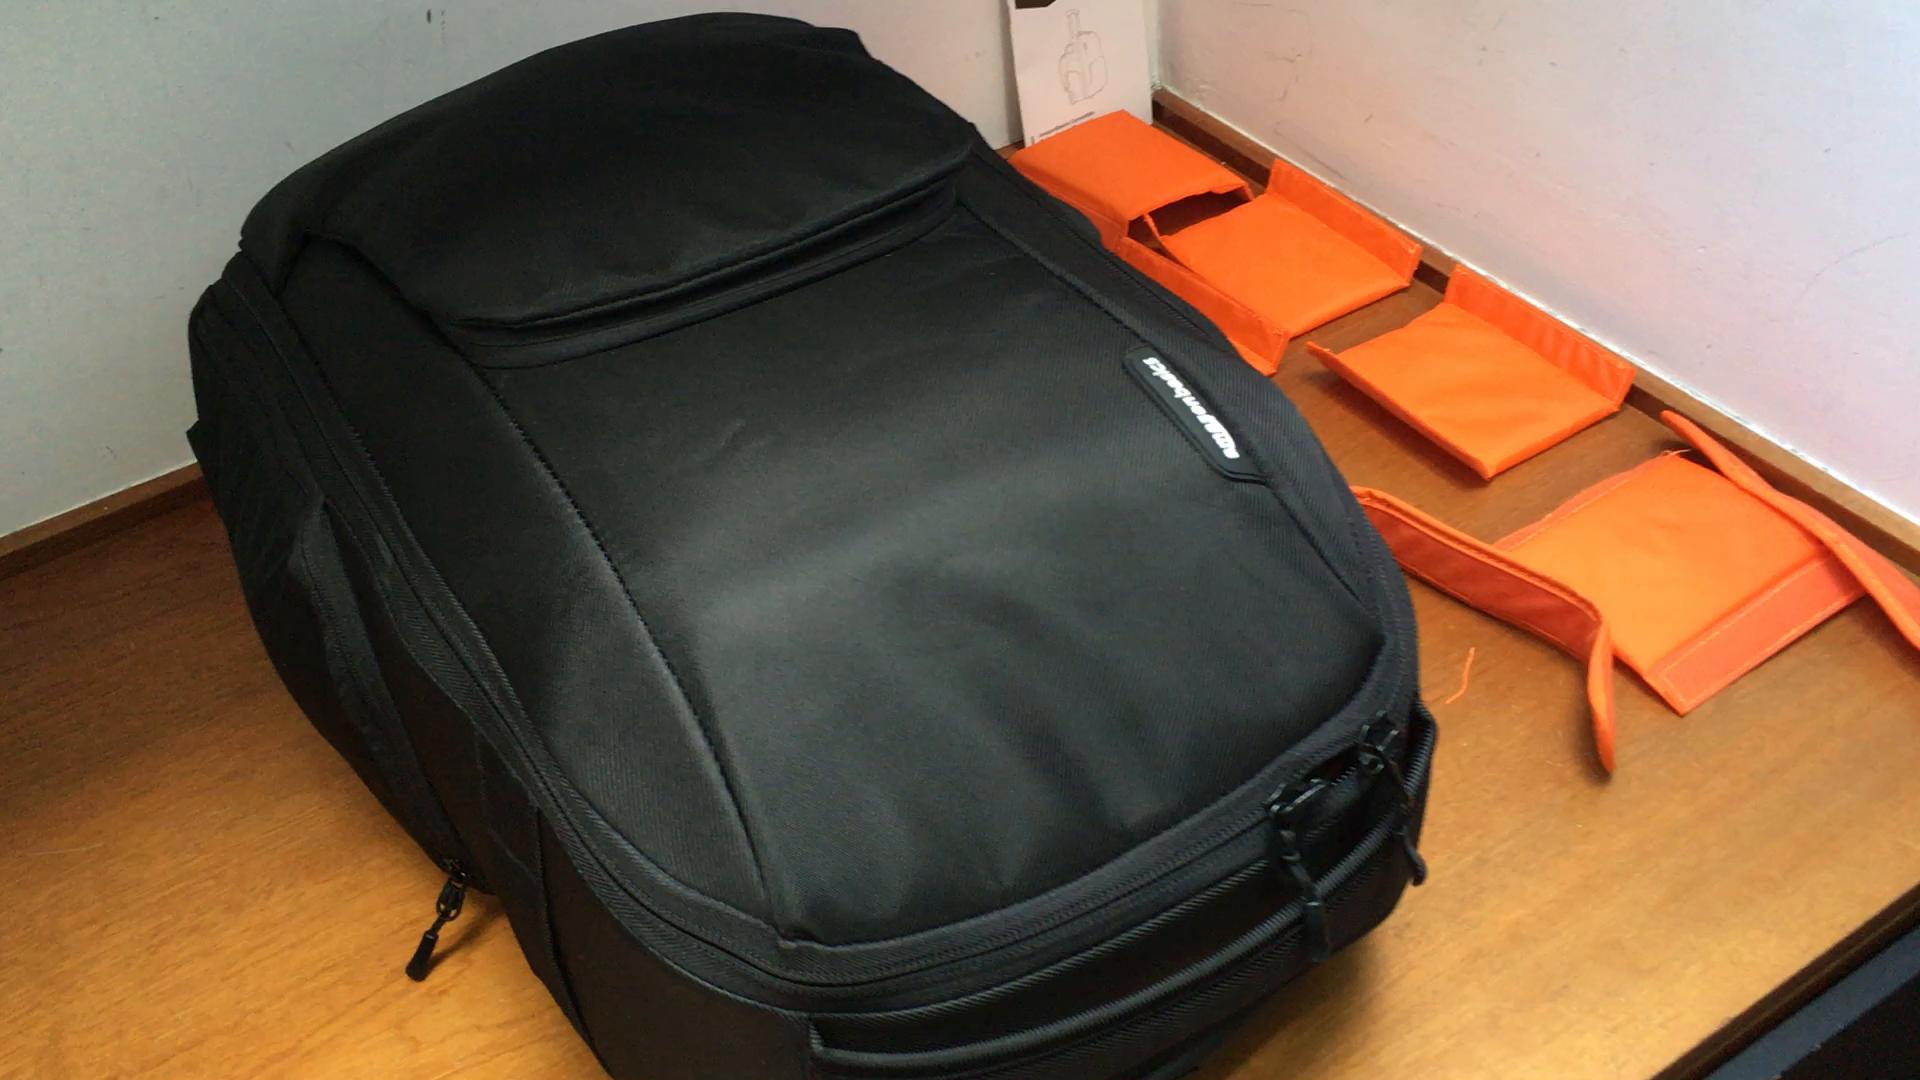 6e414332462 Amazon.es Opiniones de clientes  AmazonBasics - Mochila convertible ...